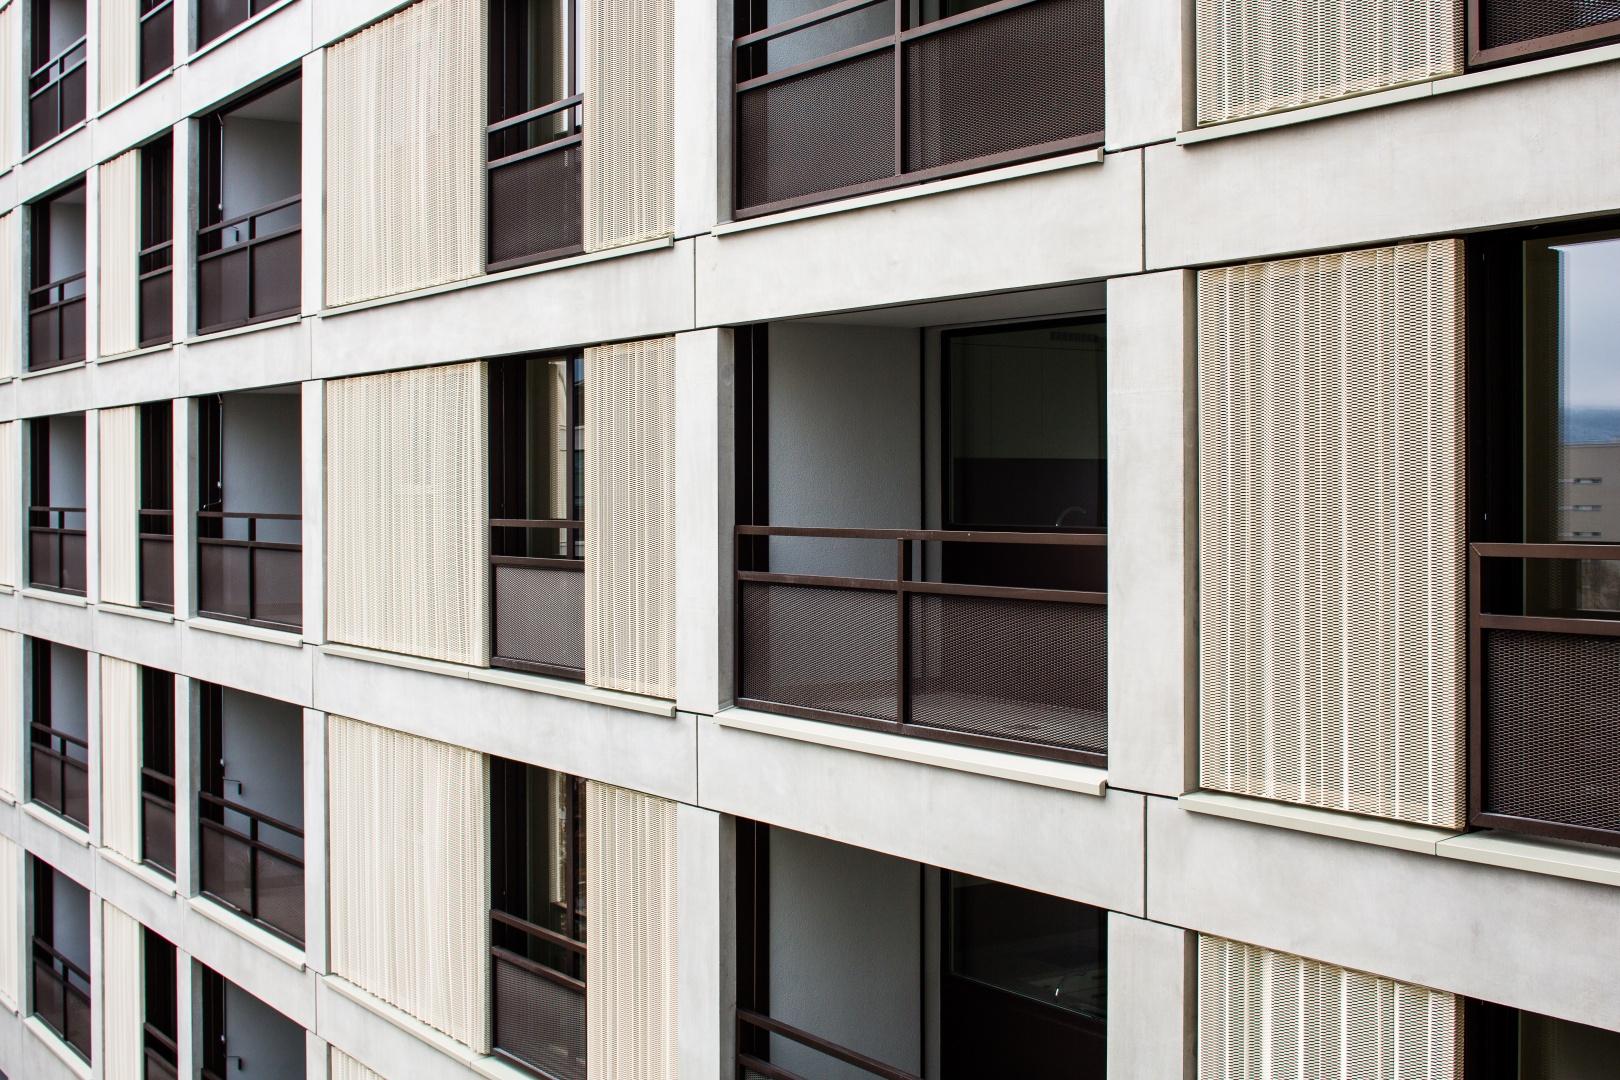 Fassadenauschnitt © Radek Brunecky